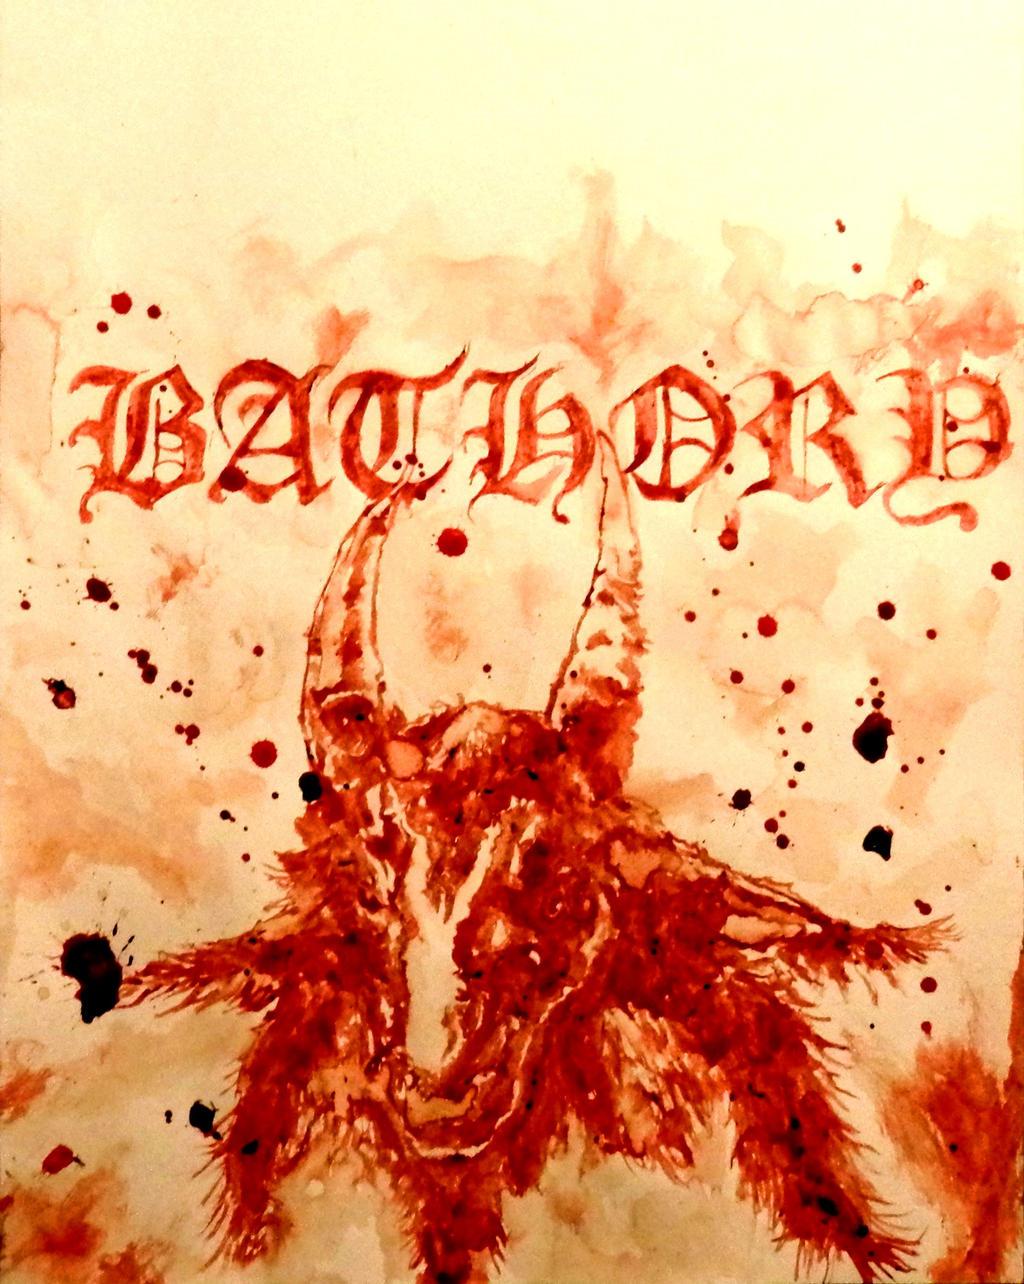 A Tribute to Bathory by PriestofTerror